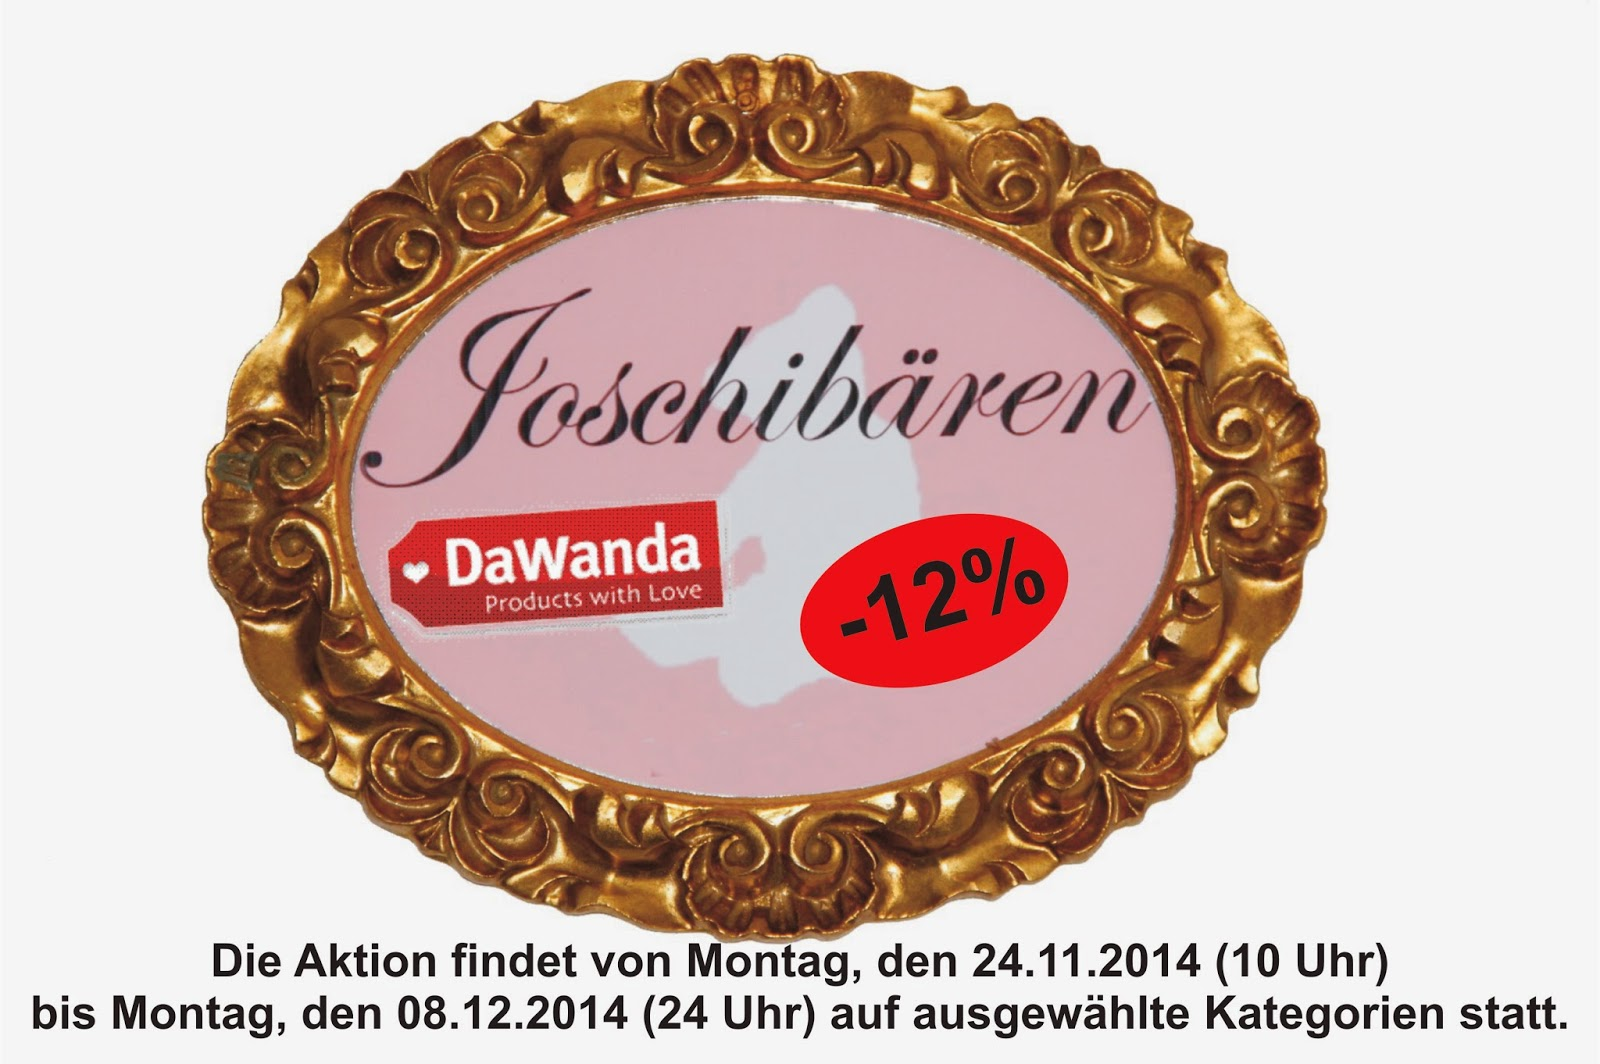 http://de.dawanda.com/shop/Joschibaeren